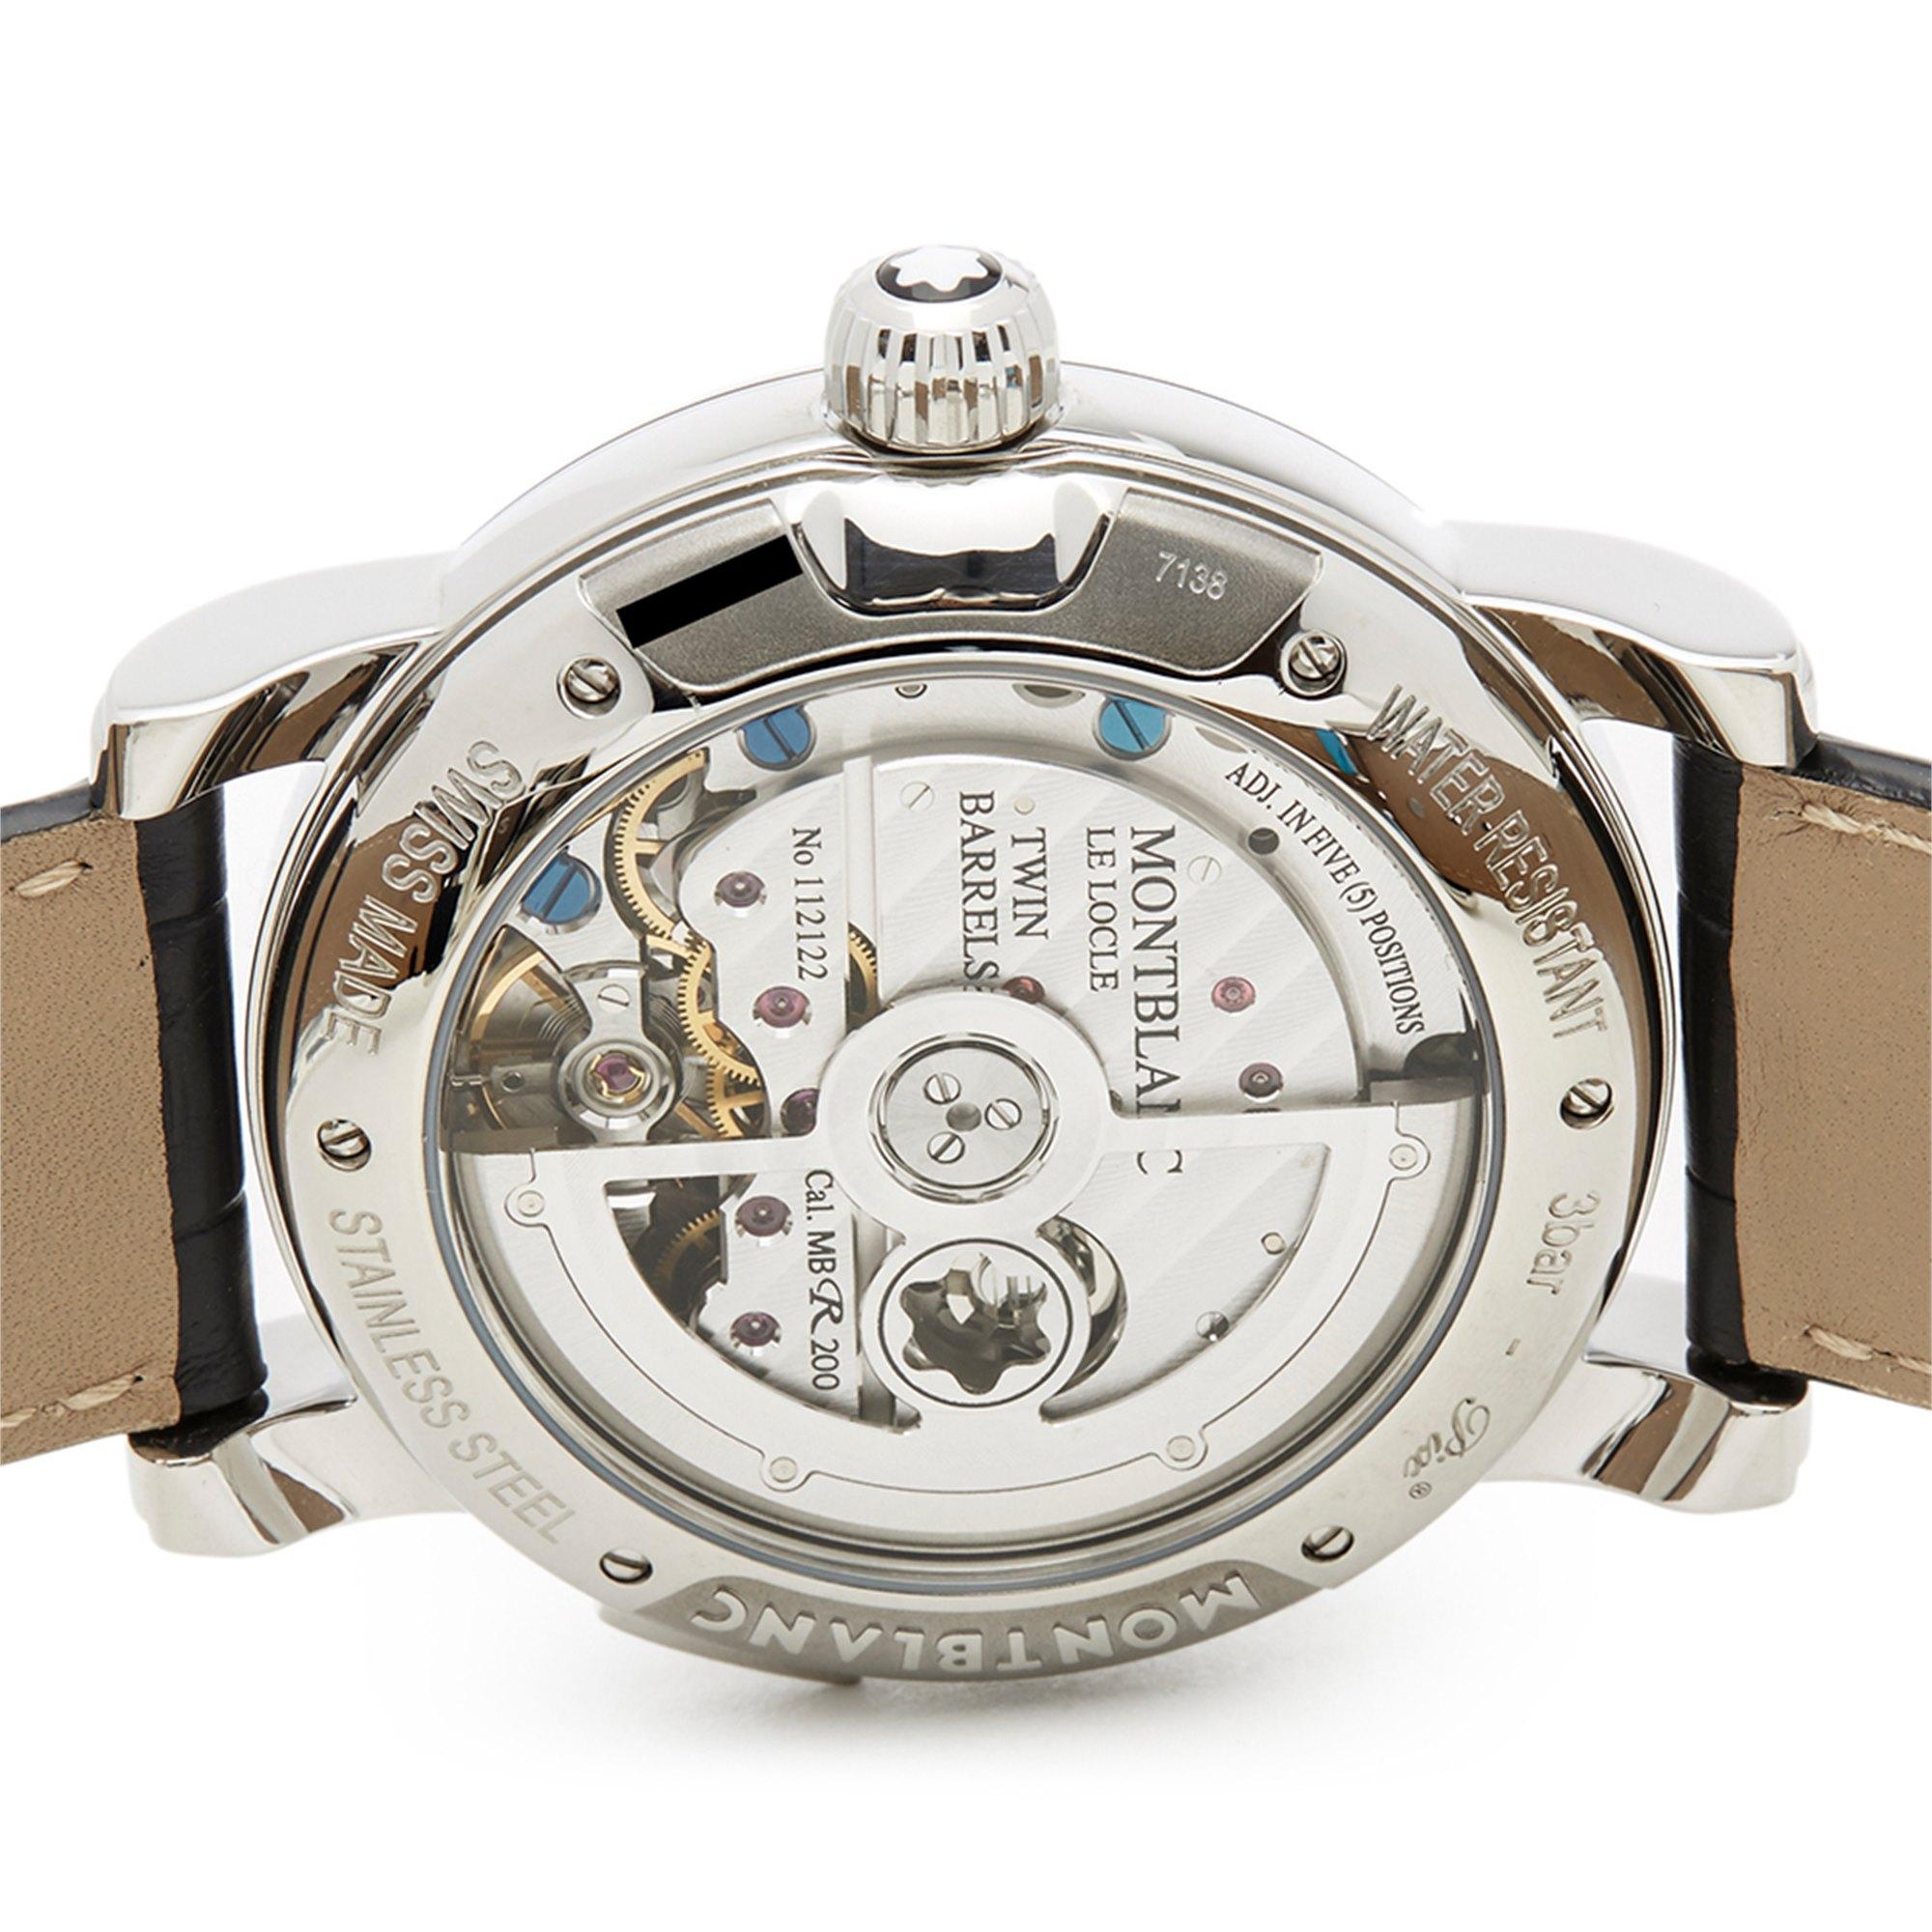 Montblanc Nicolas Rieussec Chronograph Roestvrij Staal 106488